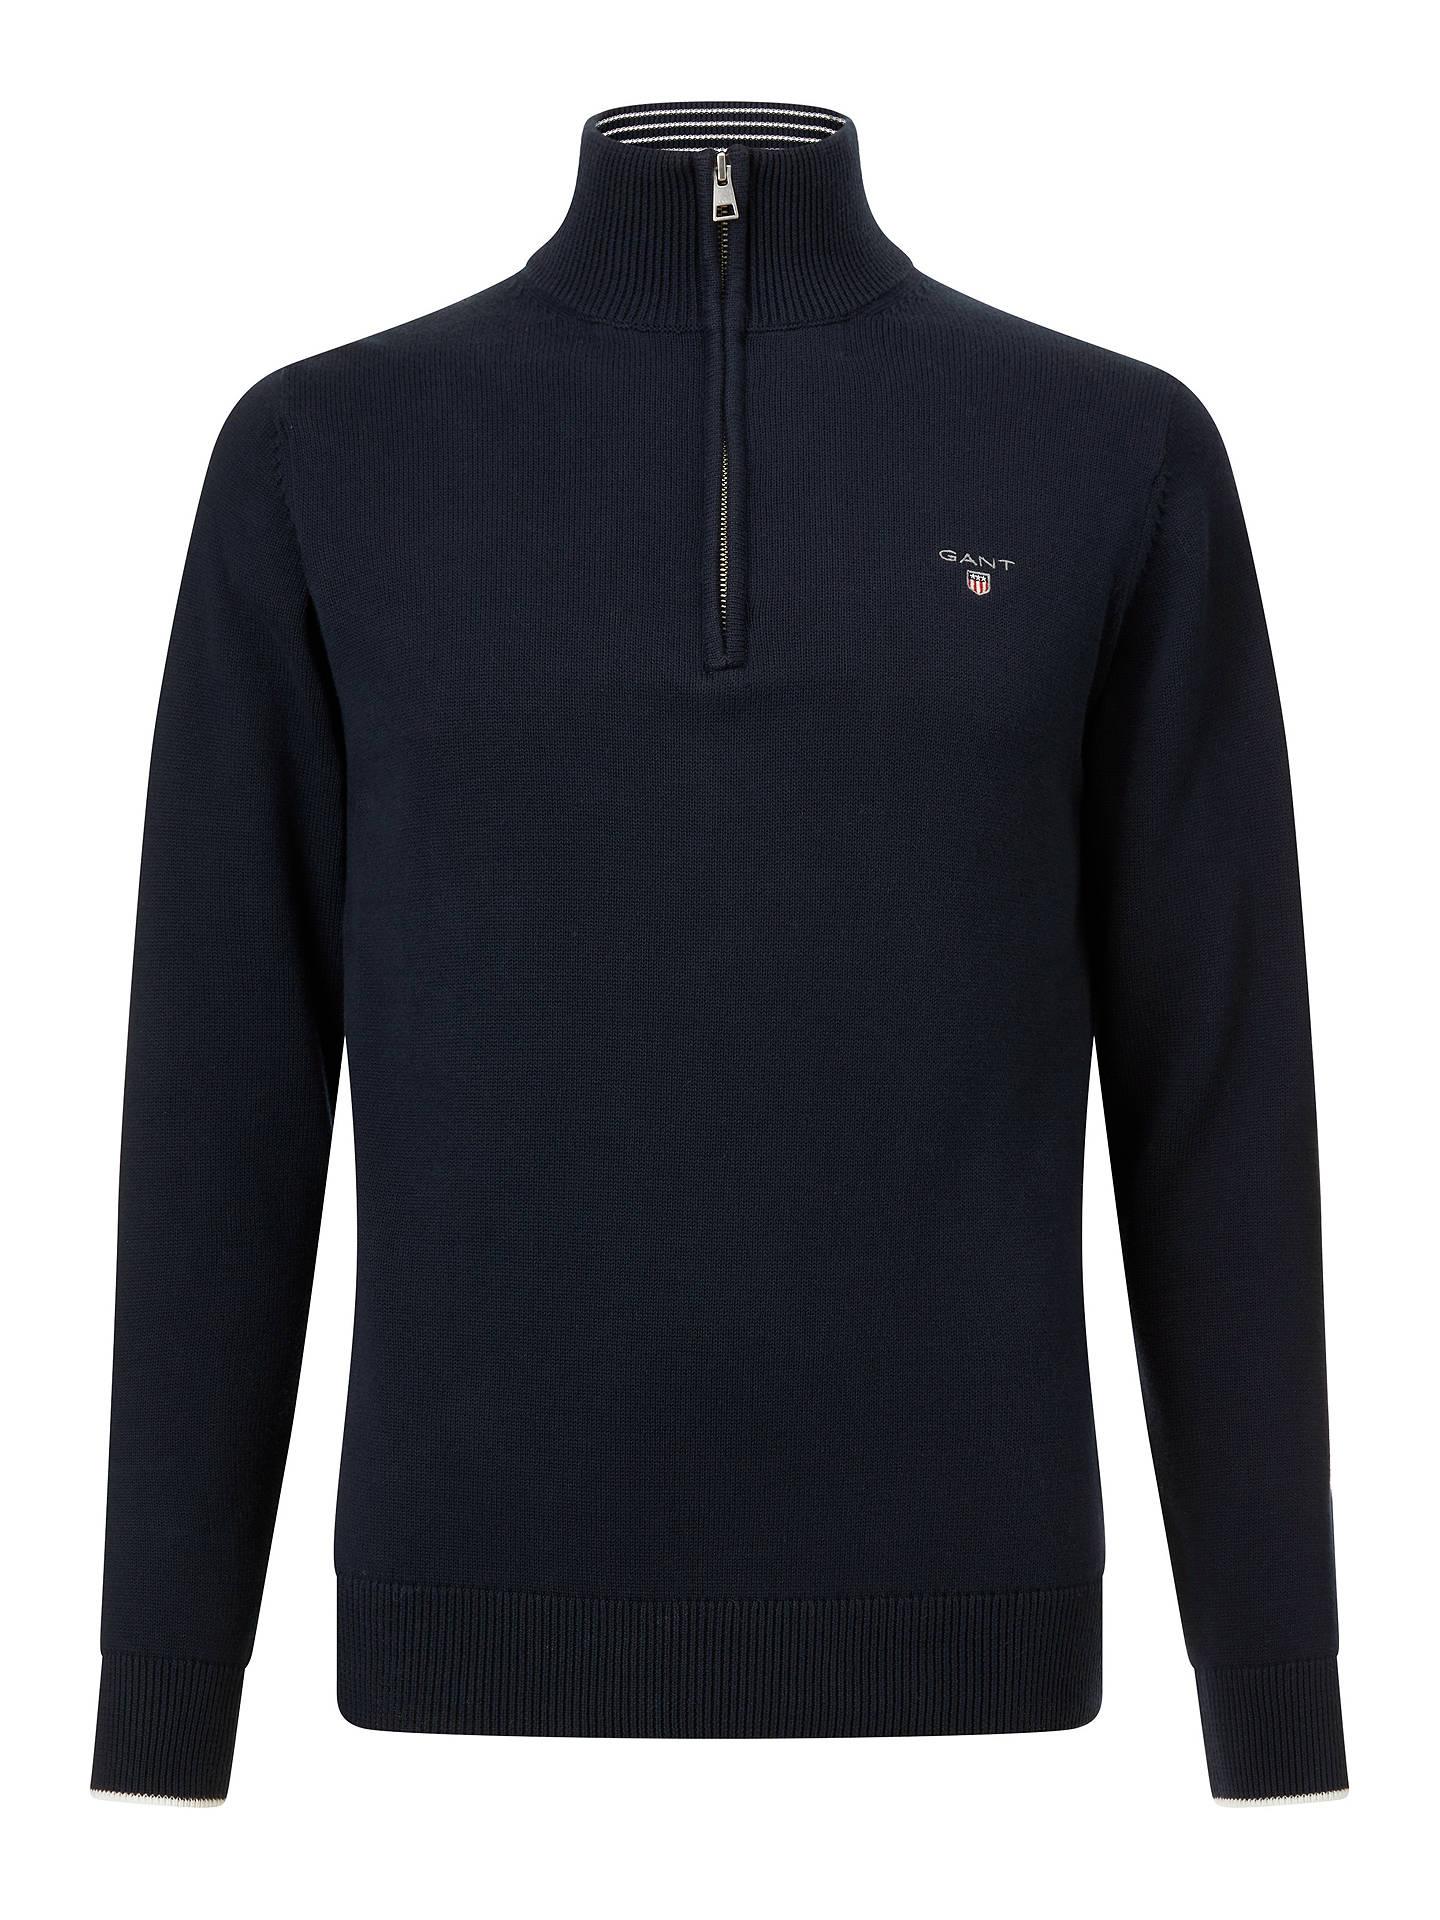 24d850d316d ... Buy GANT Contrast Half Zip Jumper, Evening Blue, M Online at  johnlewis.com ...